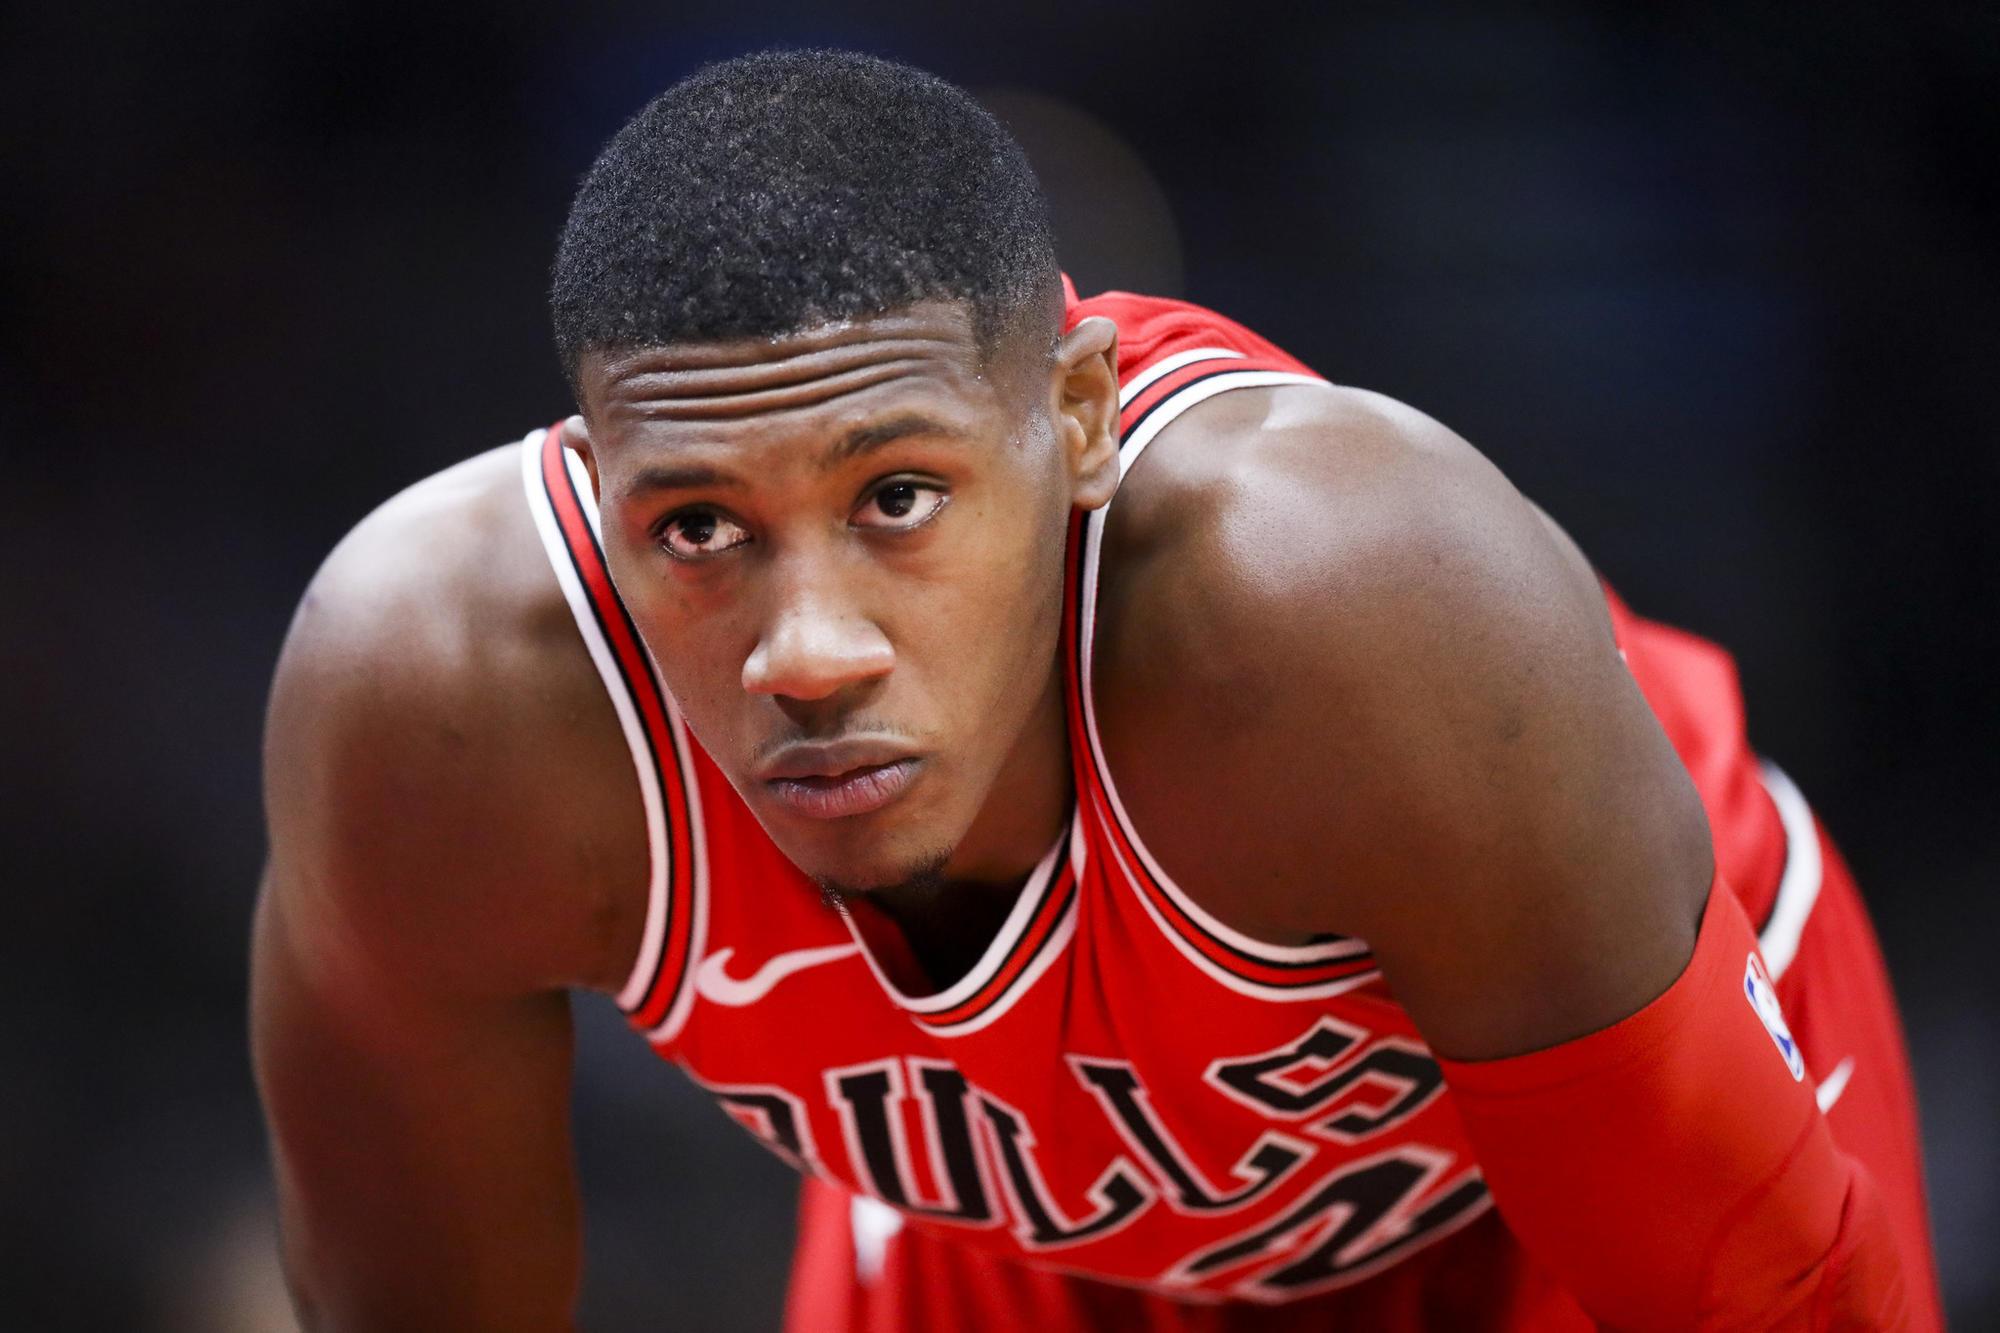 Kris Dunn Practices Again Could Return For Final Bulls